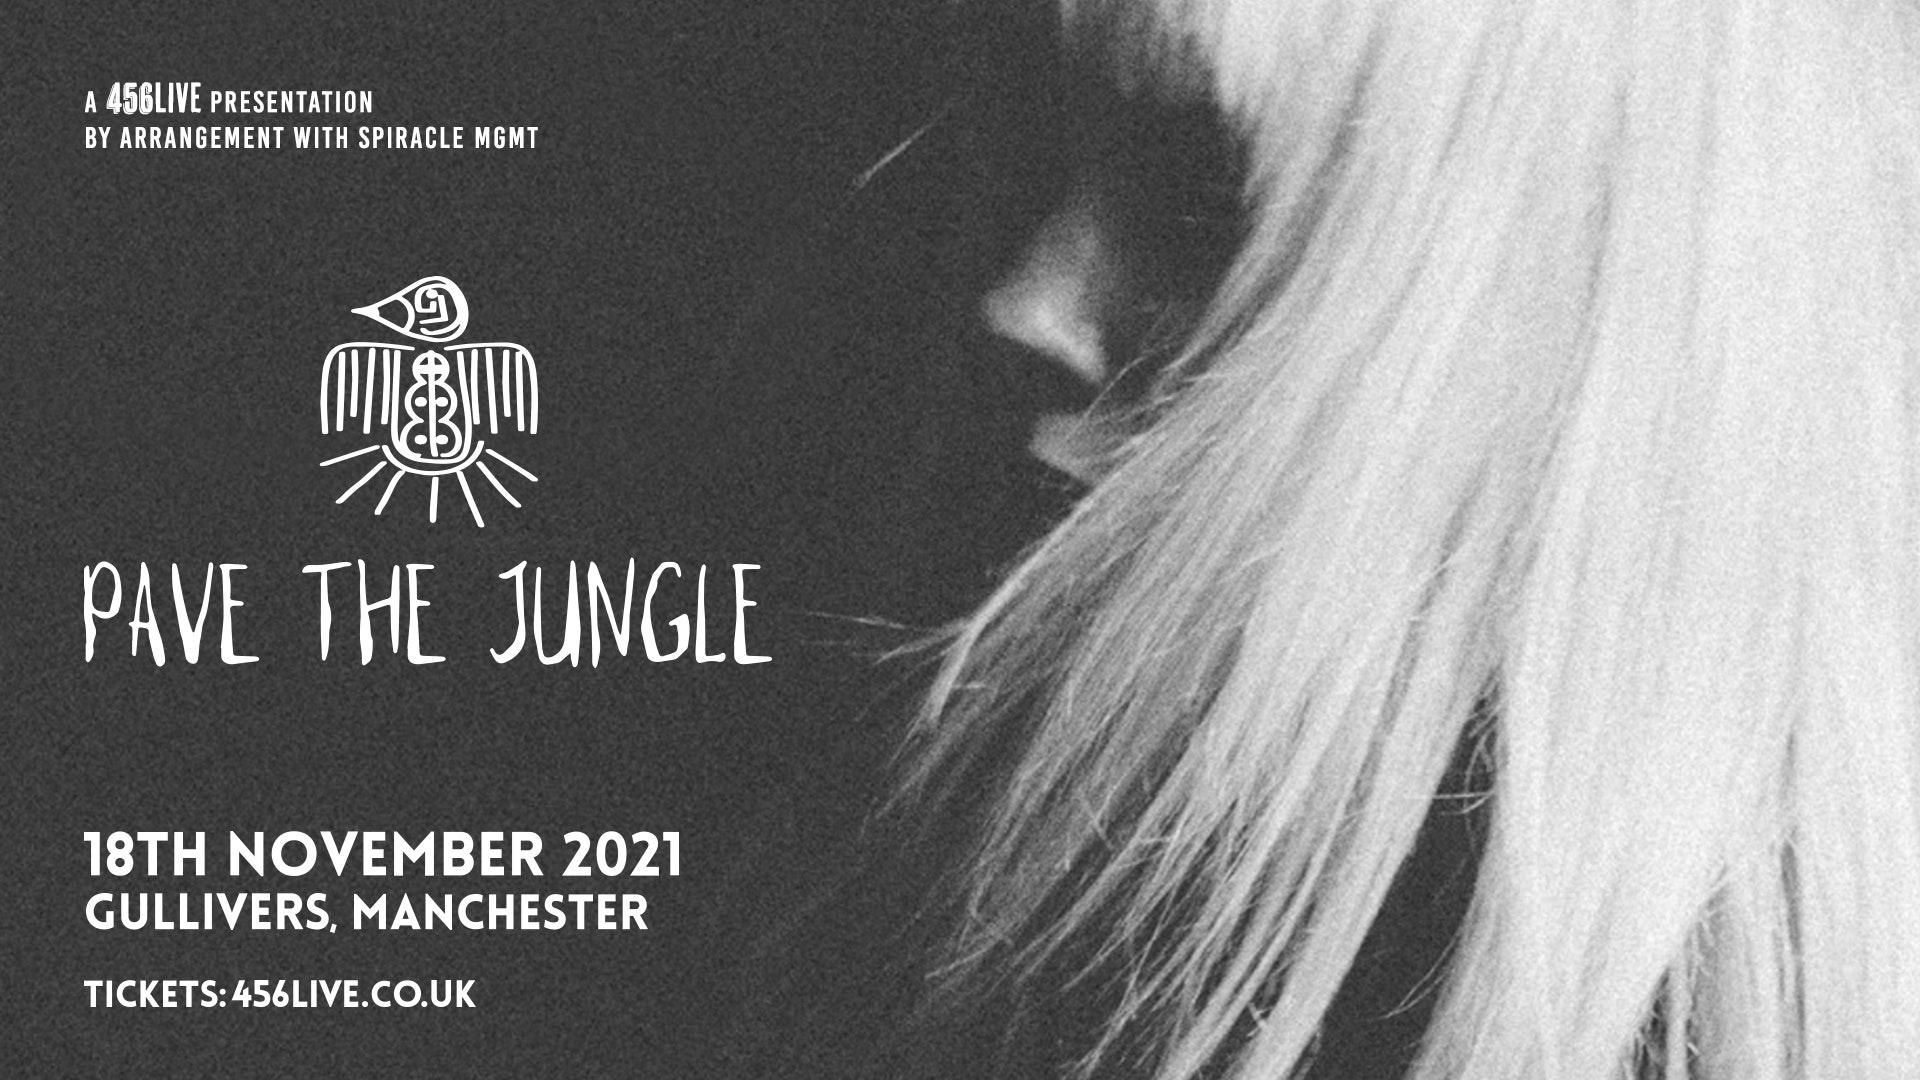 Pave the Jungle